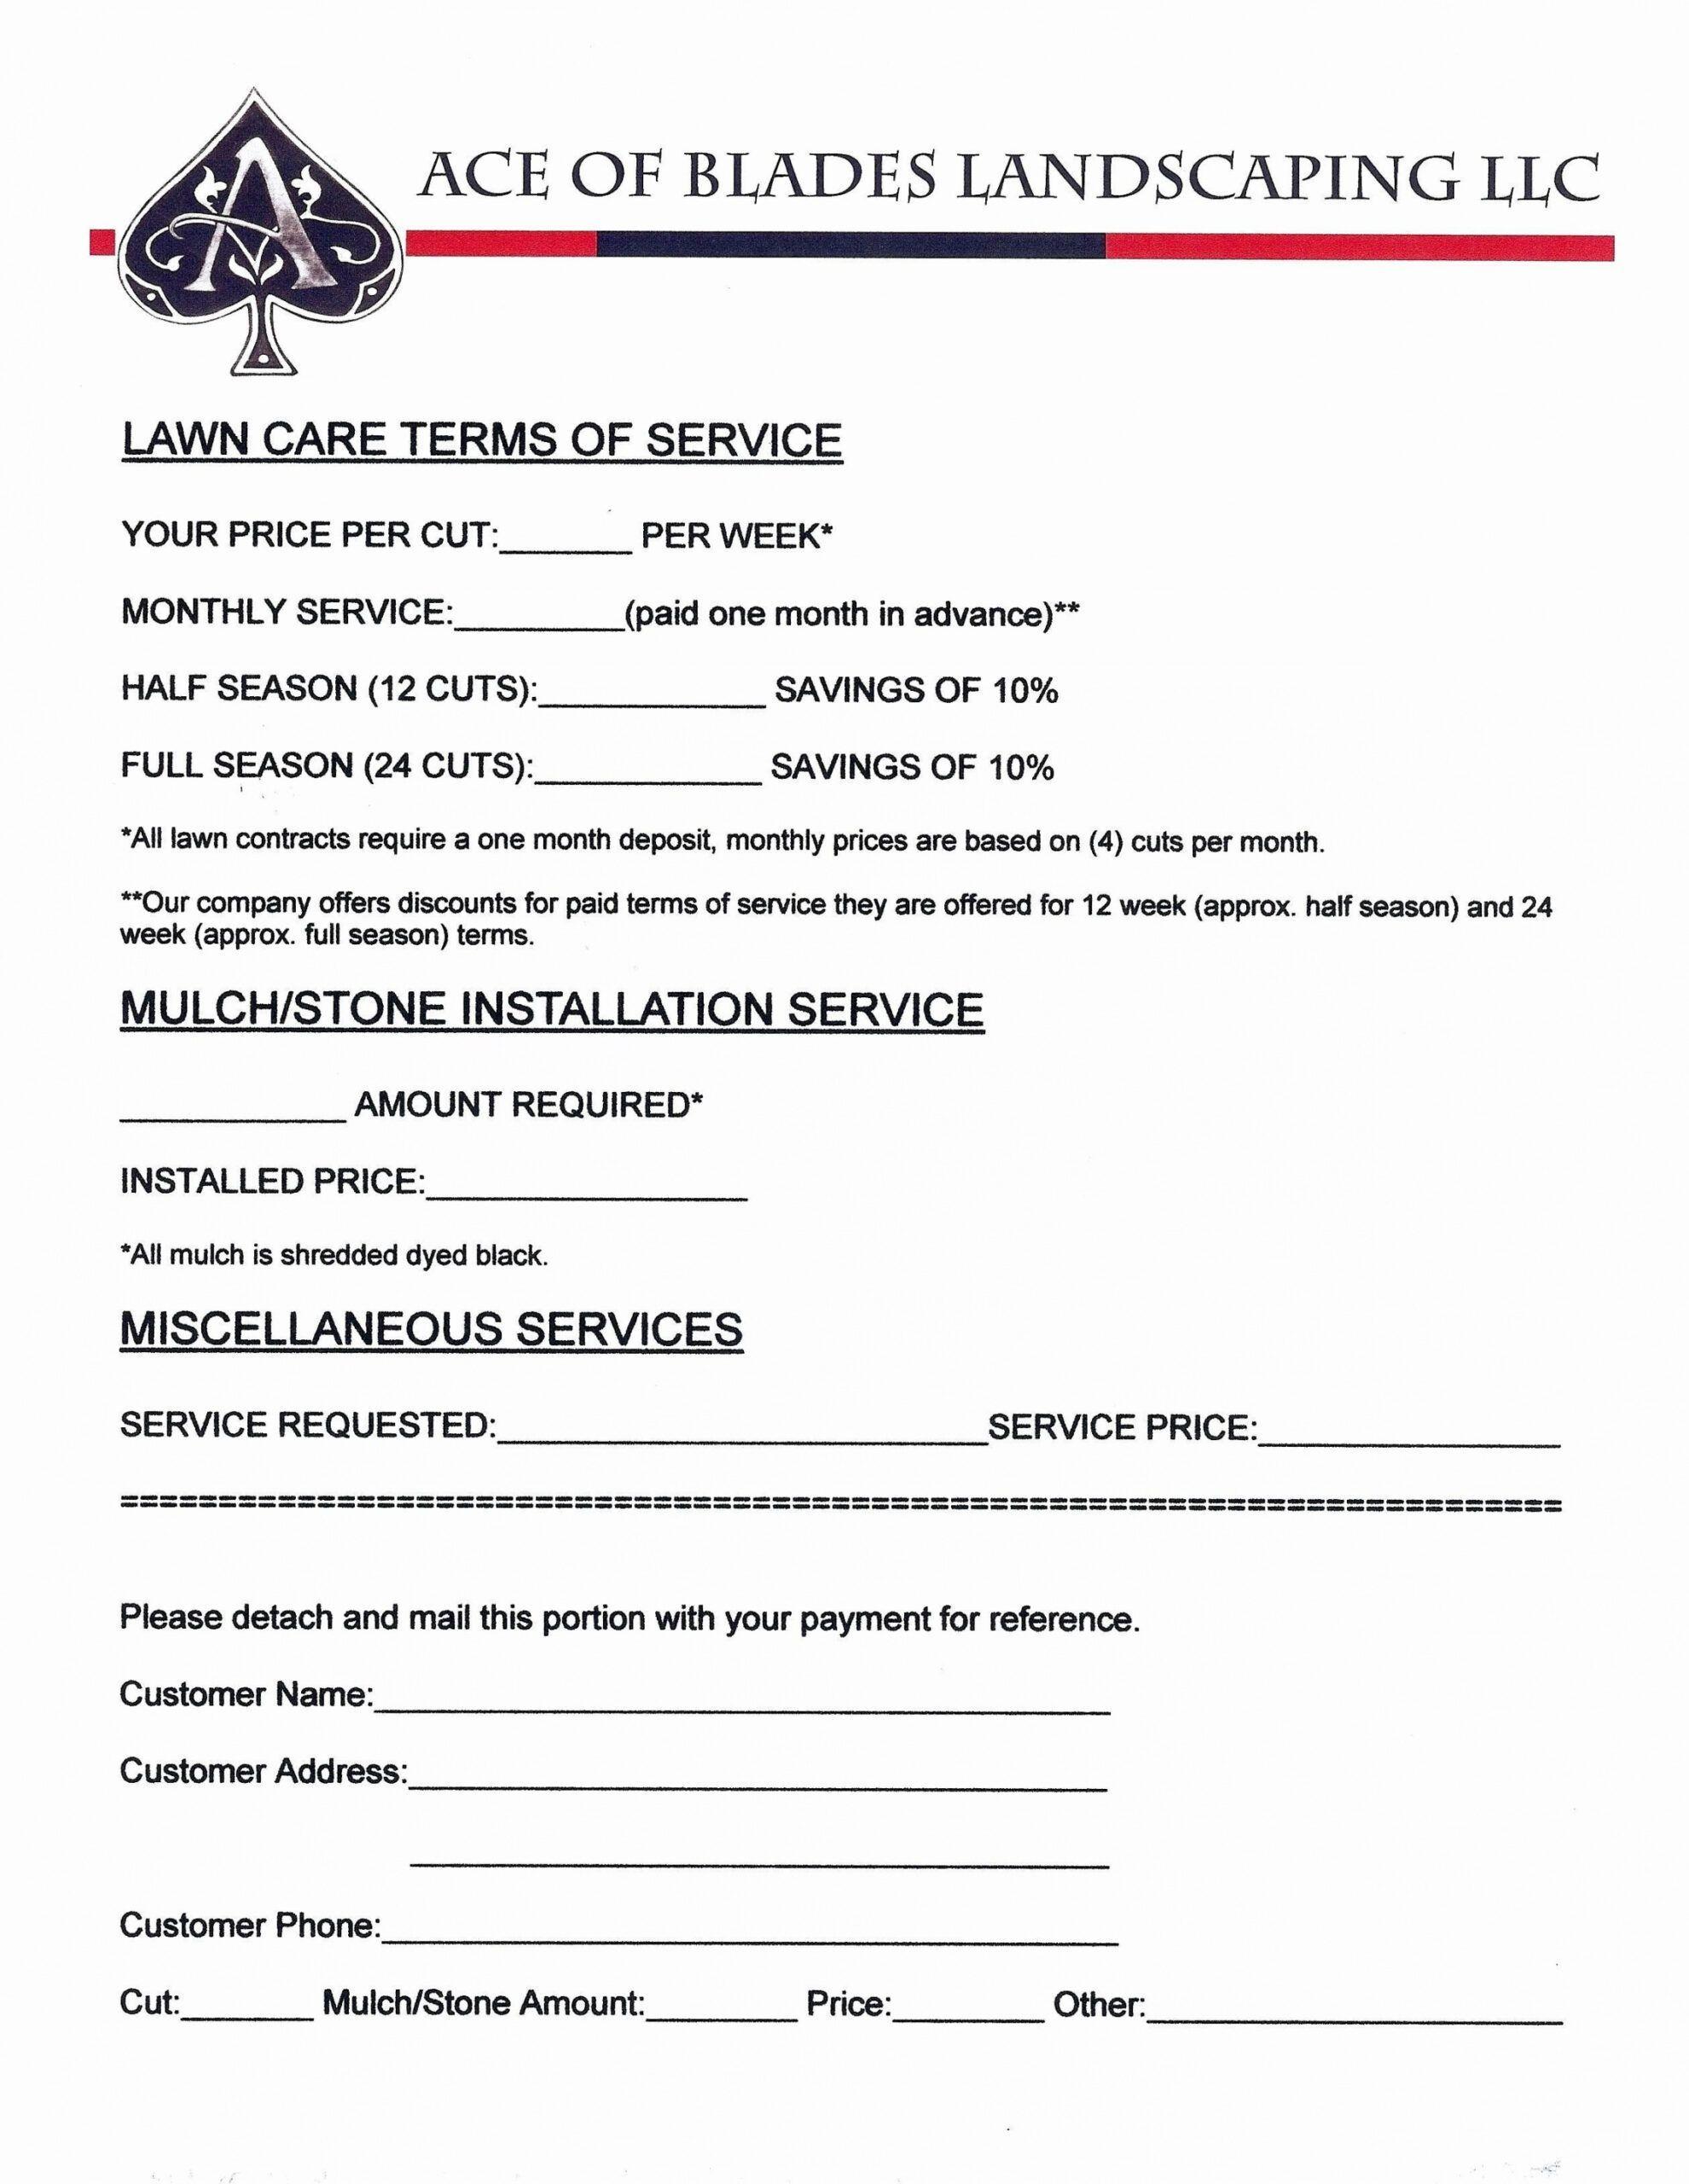 Lawn Care Service Quote Template Lawn Care Business Lawn Maintenance Lawn Care